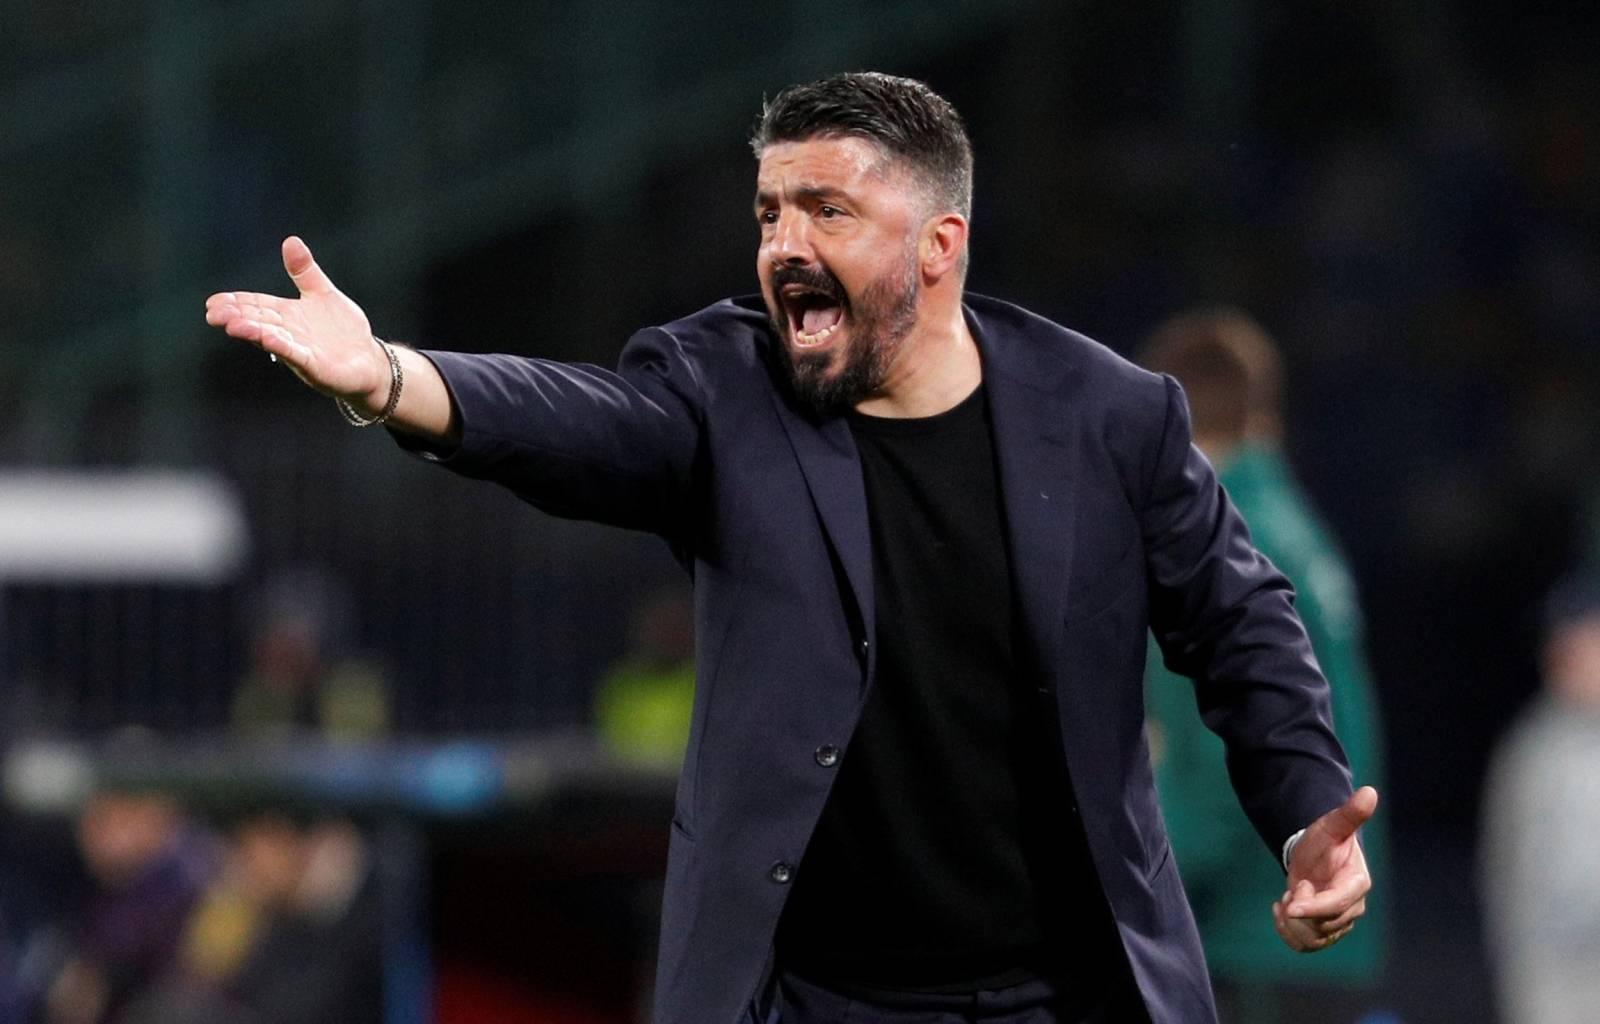 Champions League - Round of 16 First Leg - Napoli v FC Barcelona